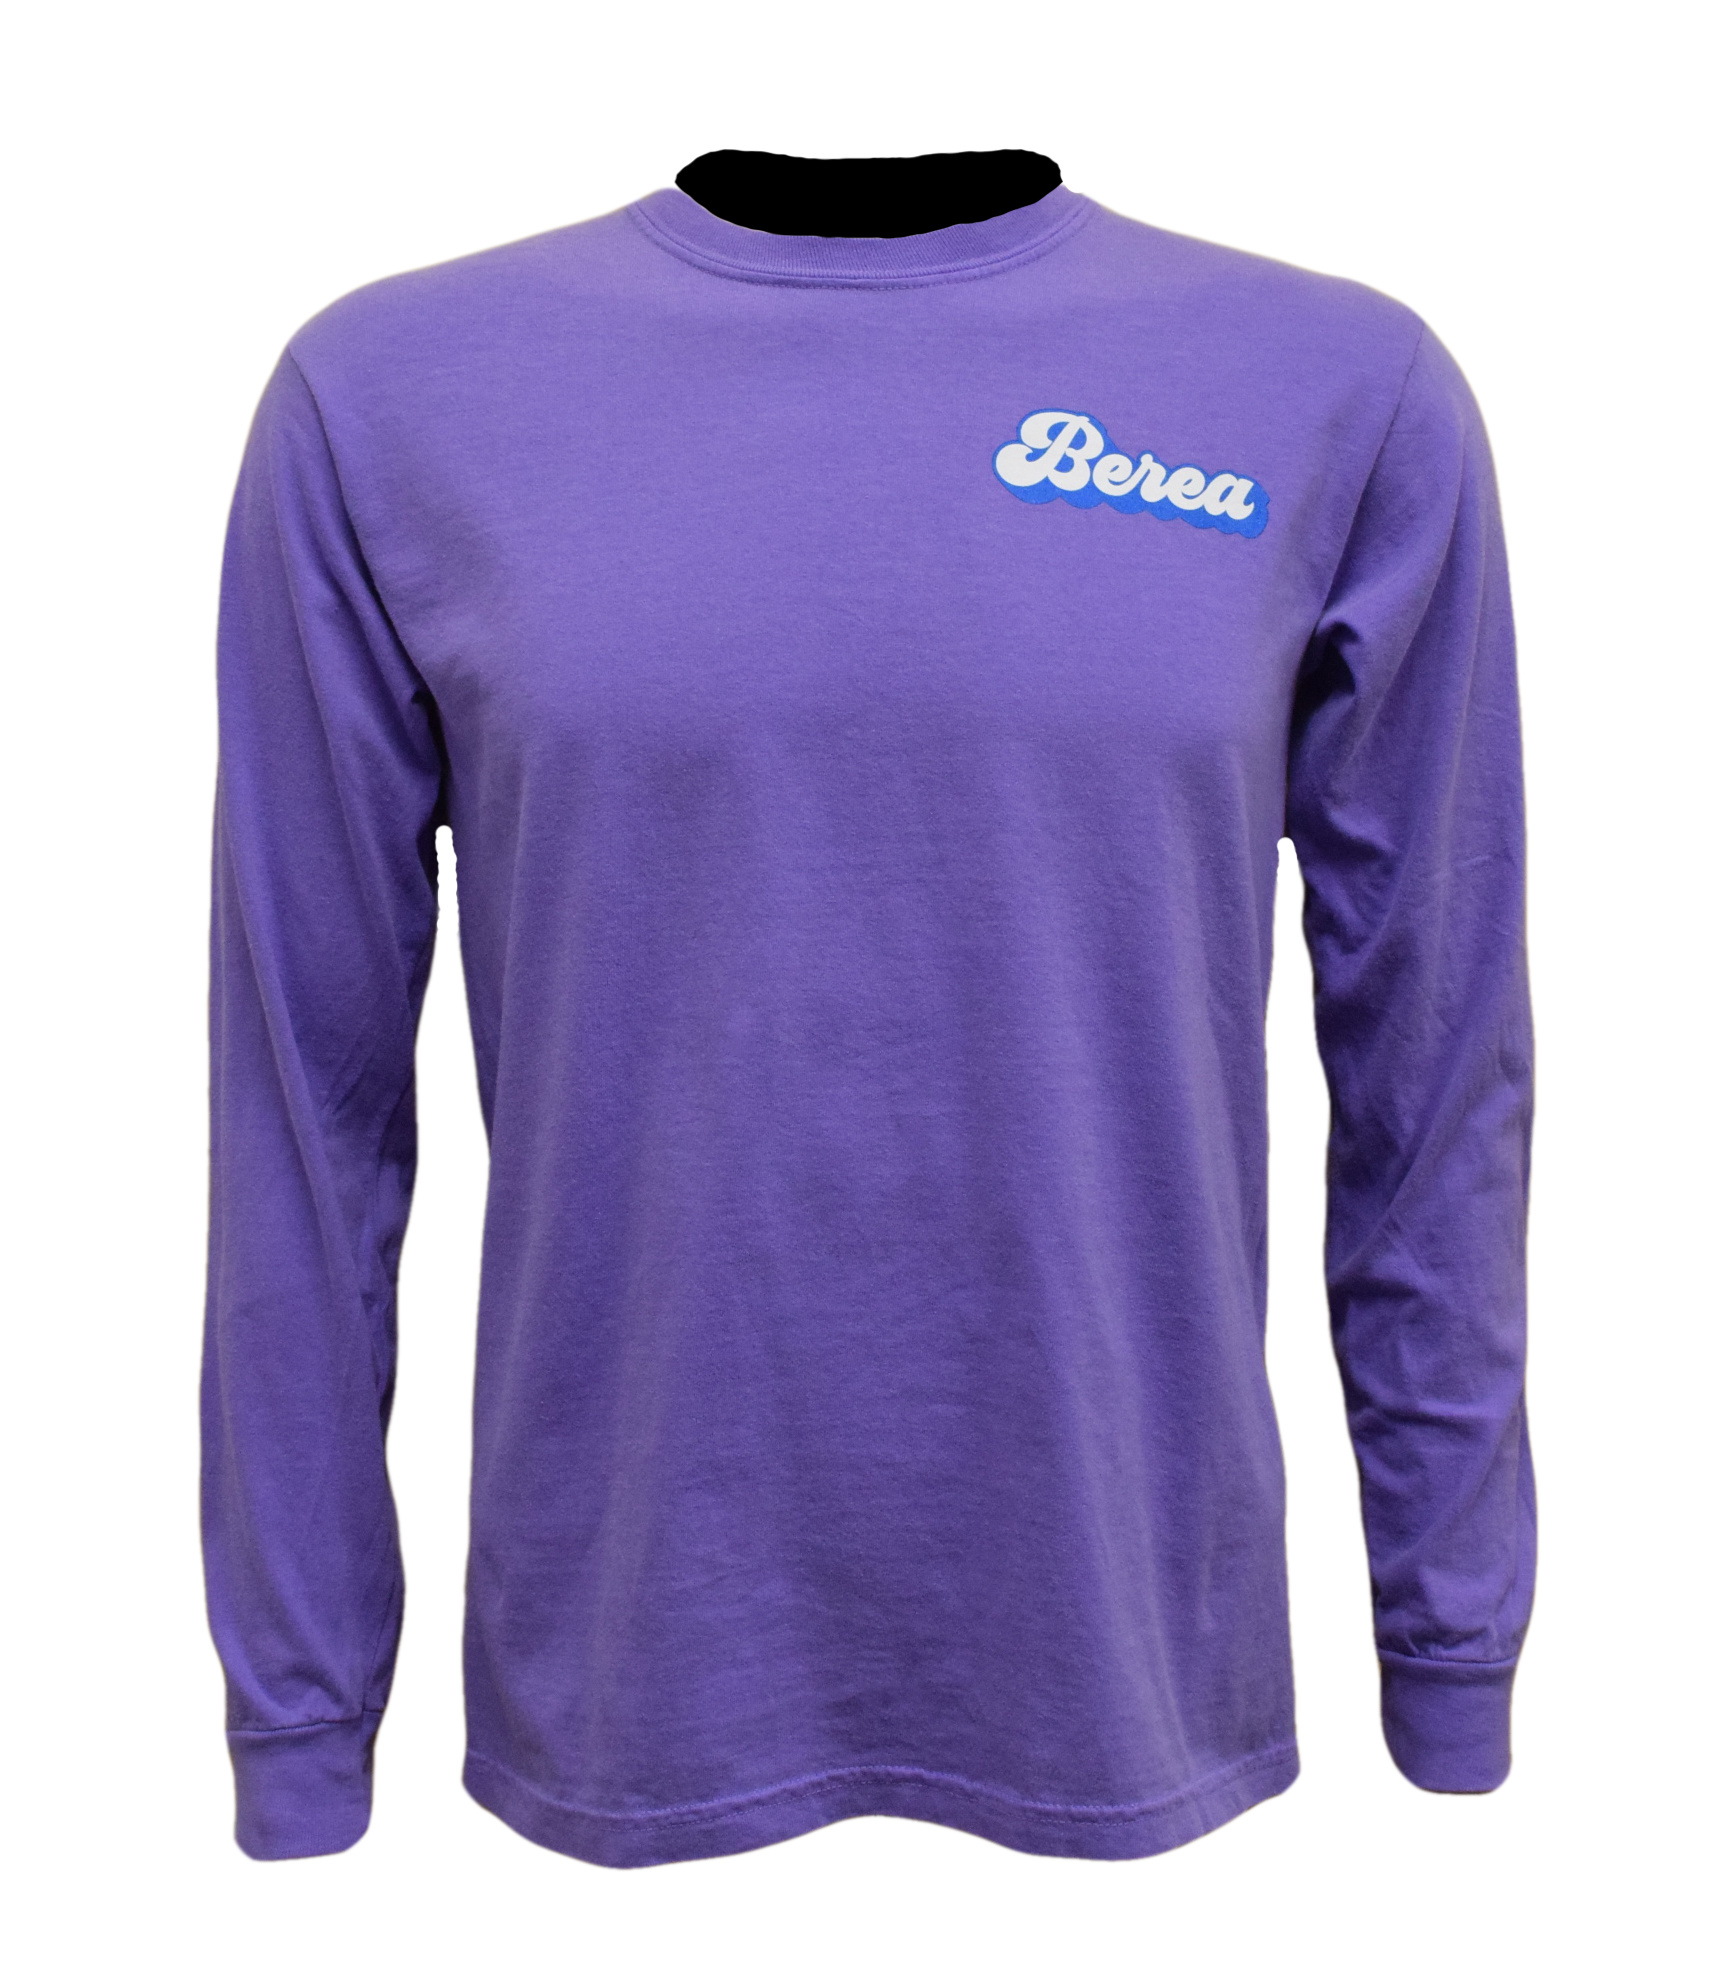 Berea Far Out T-Shirt-1